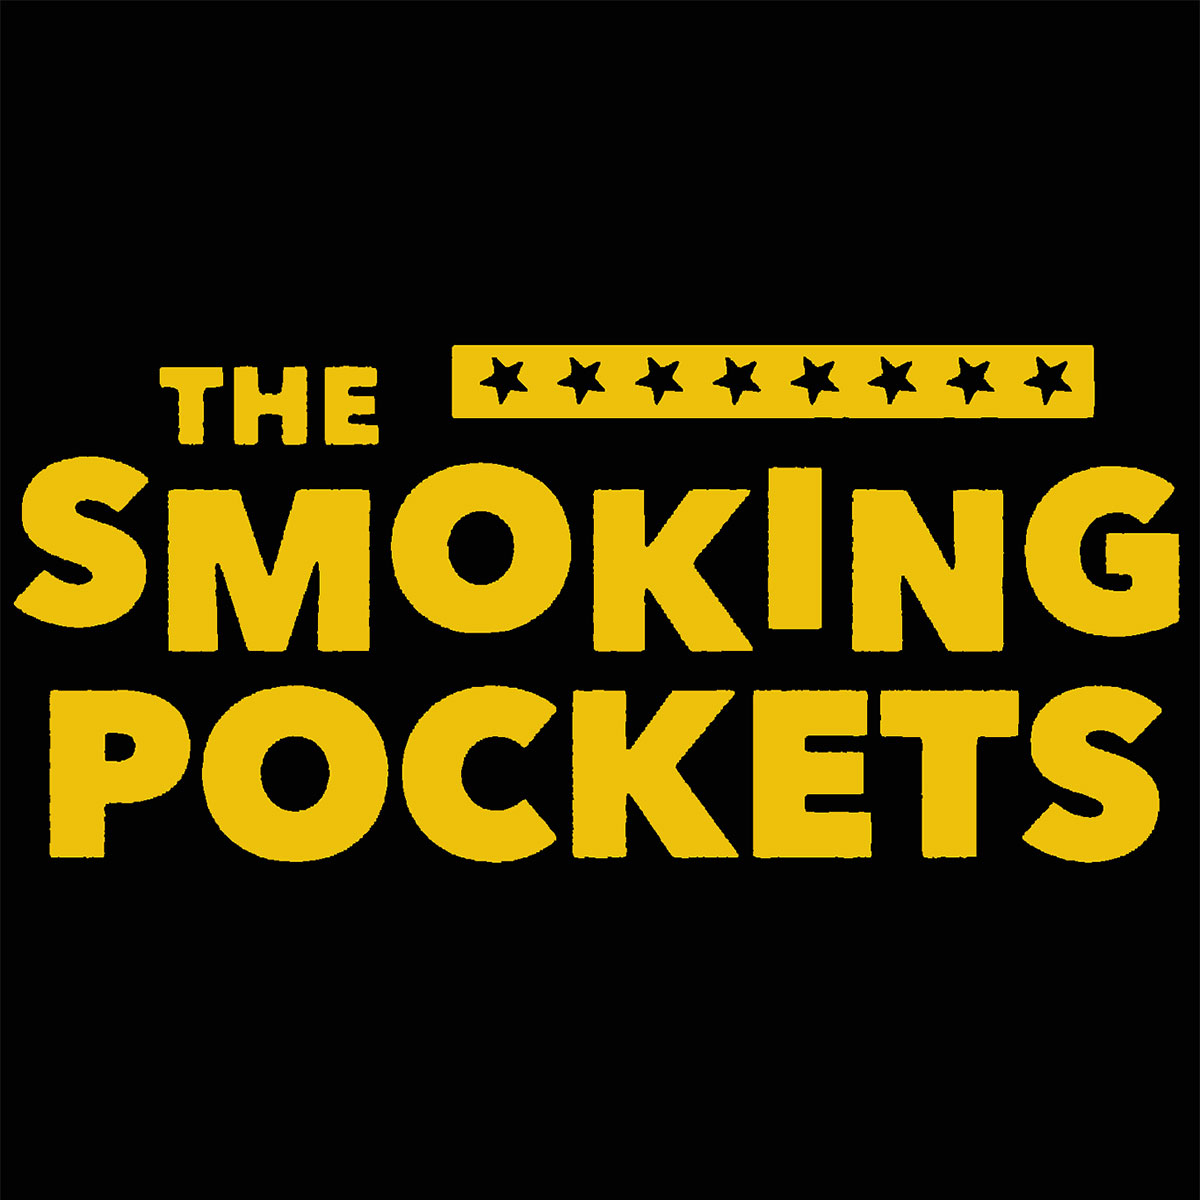 The Smoking Pockets